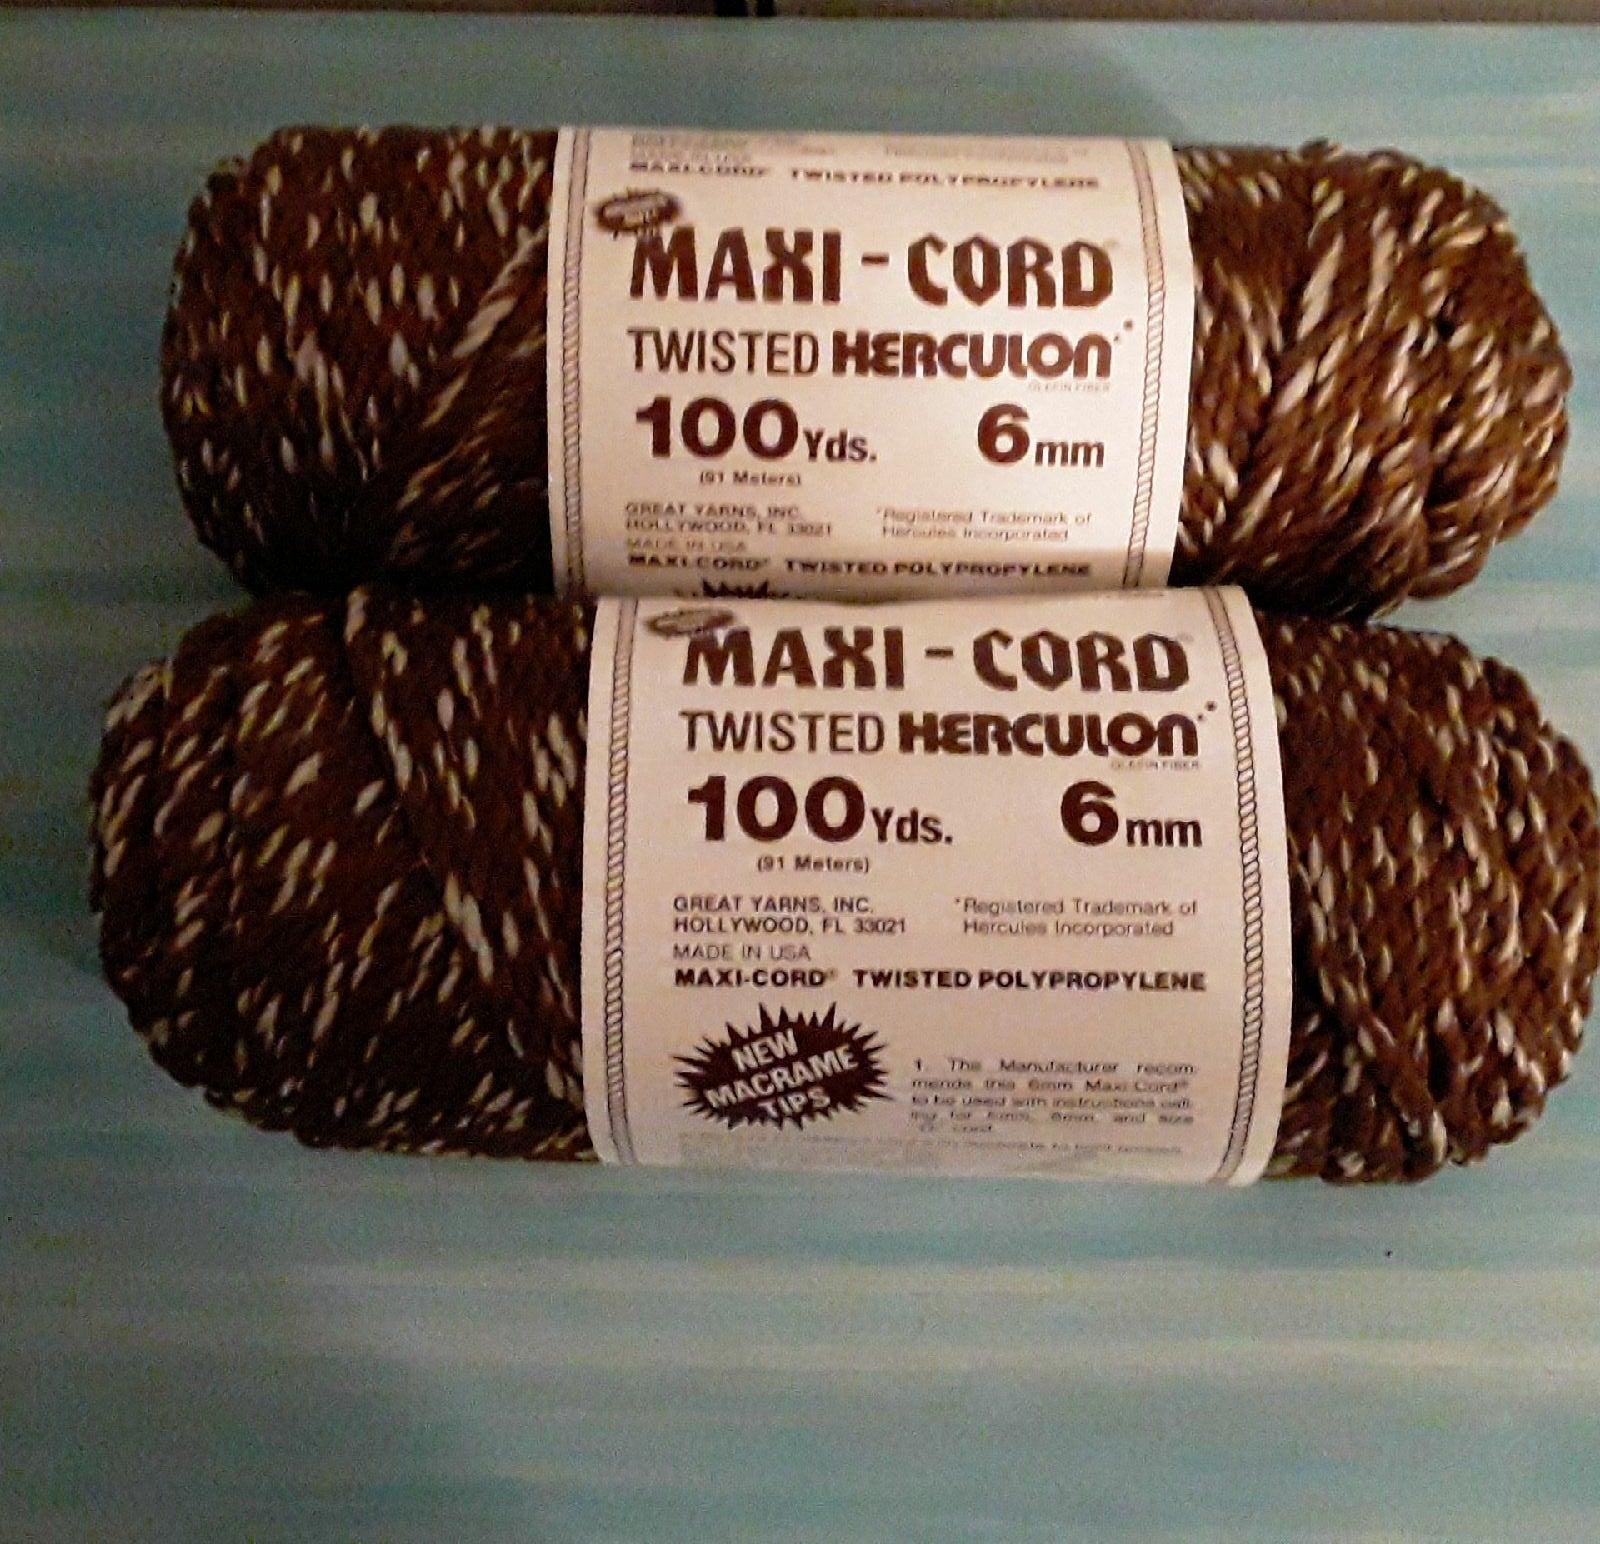 Vintage Maxi-Cord Twisted Herculon 6mm